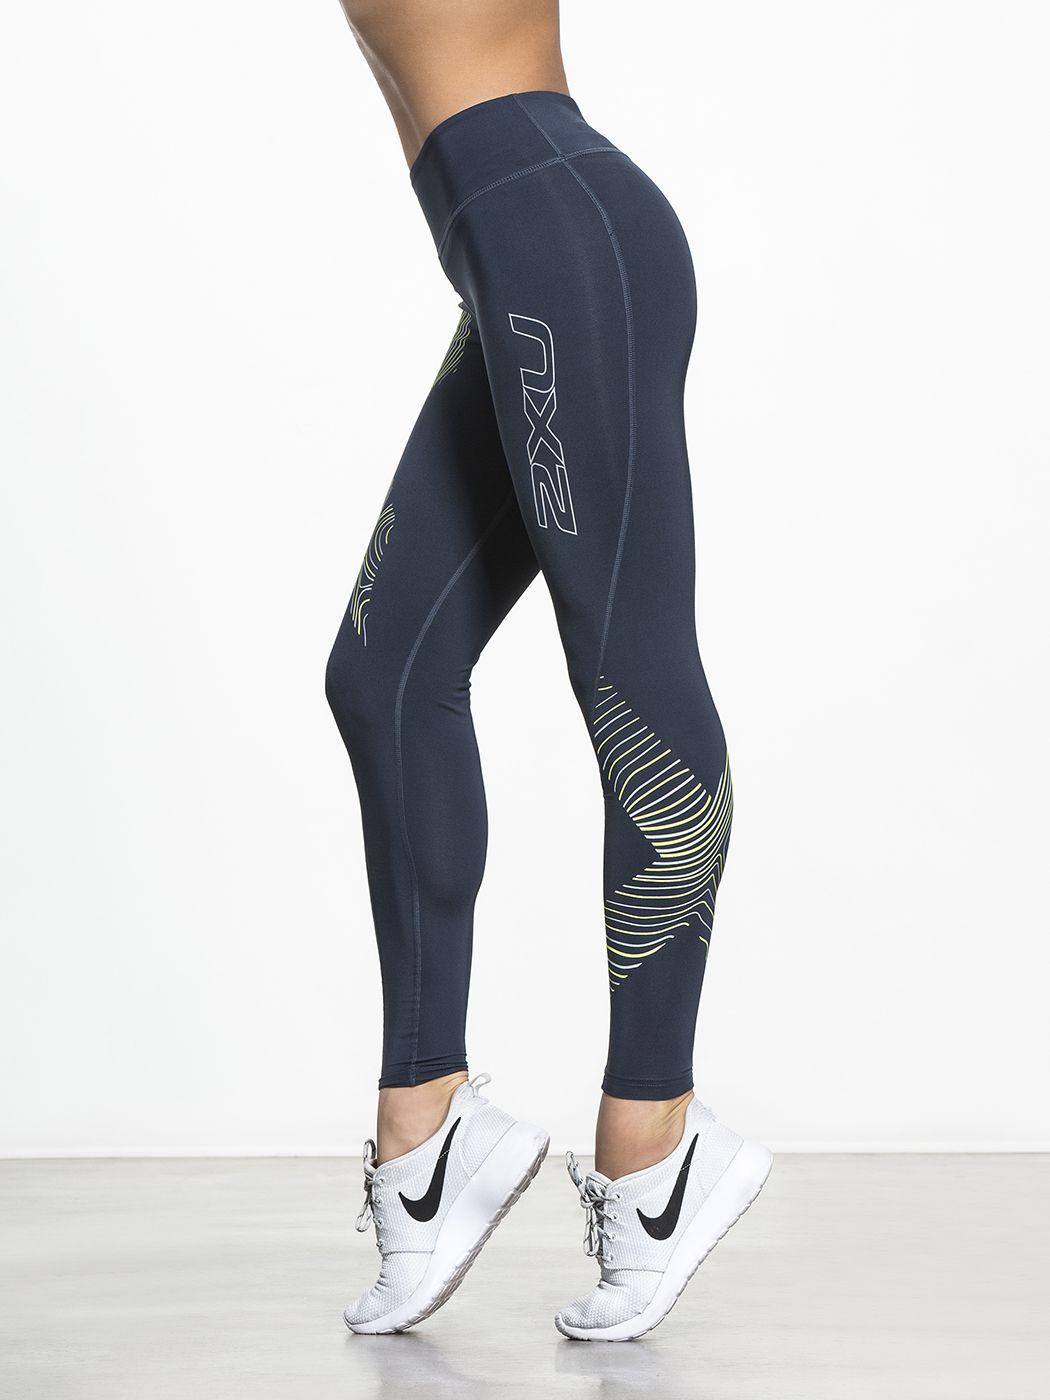 9b2b2911d7 Hyoptik Mid Rise Compression | 2XU Compression | Girls in leggings ...